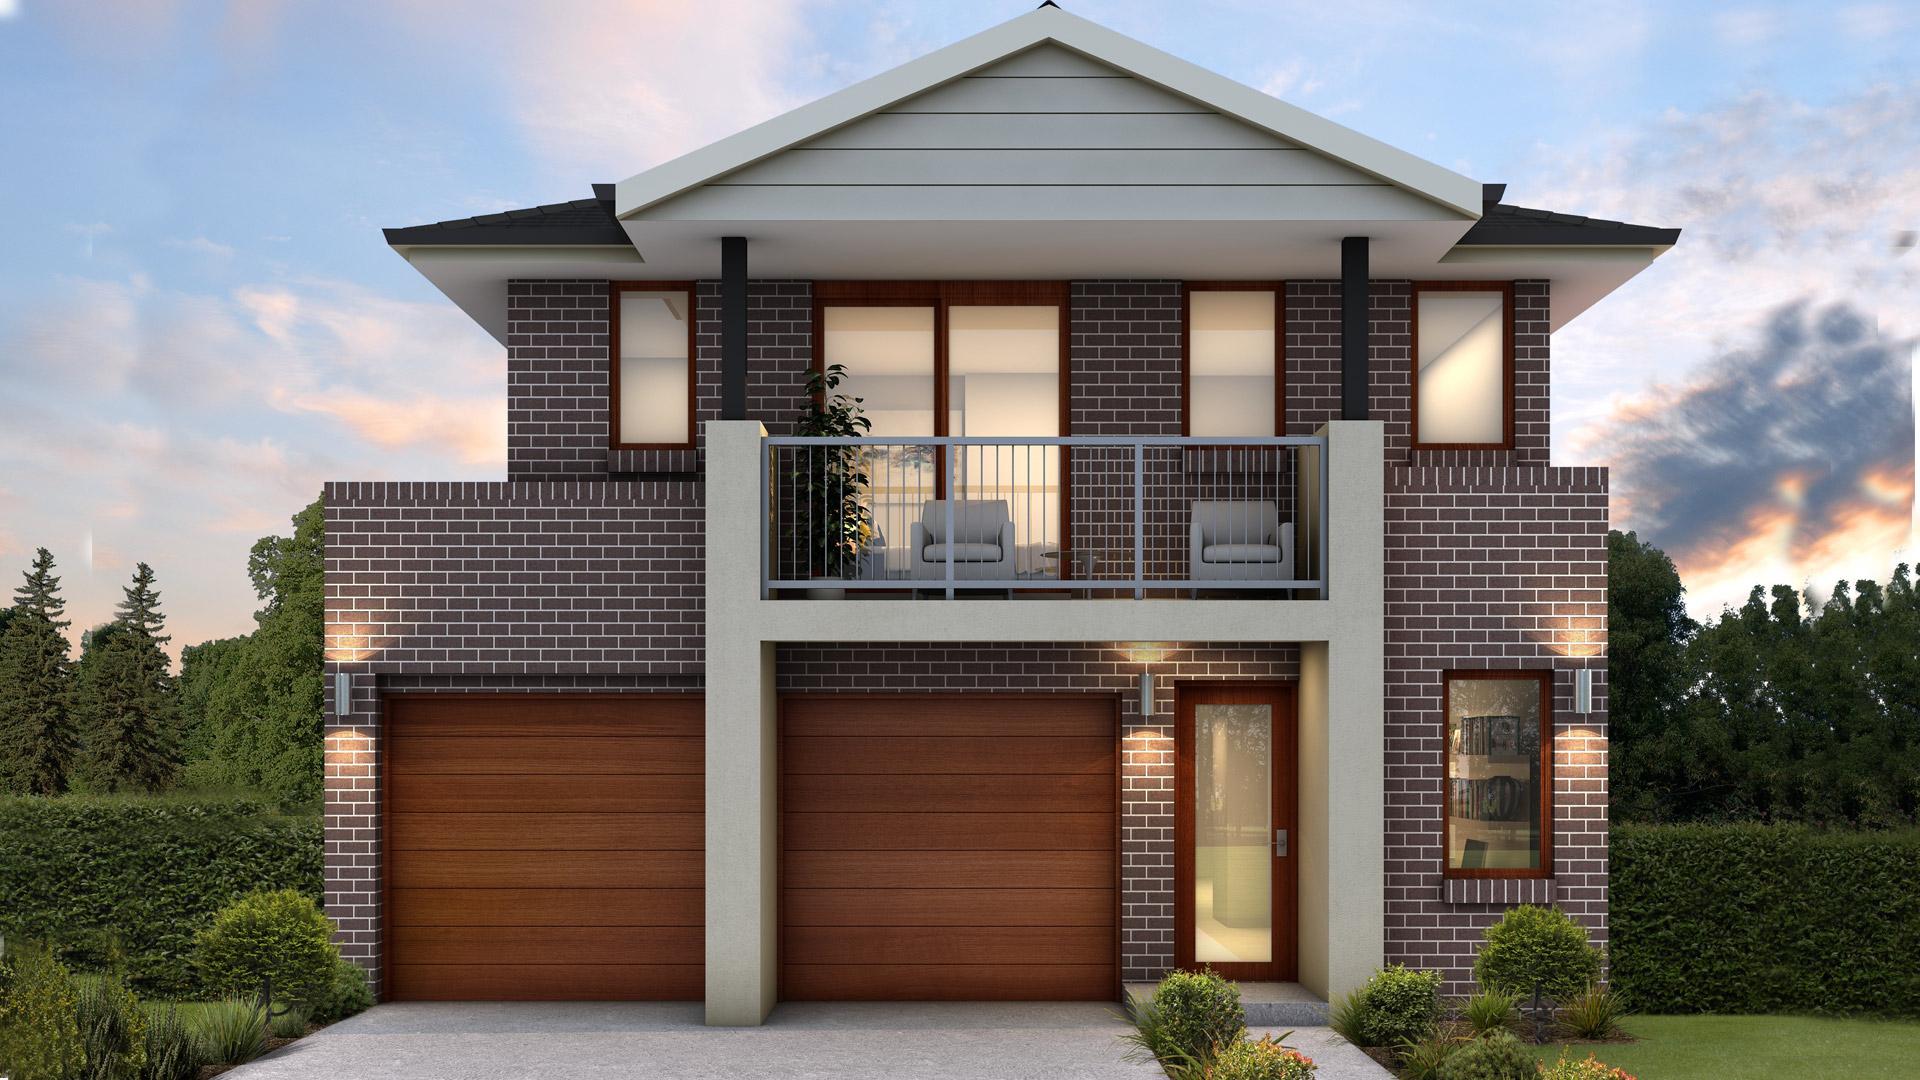 Tallowood - Advantage | Eden Brae Homes